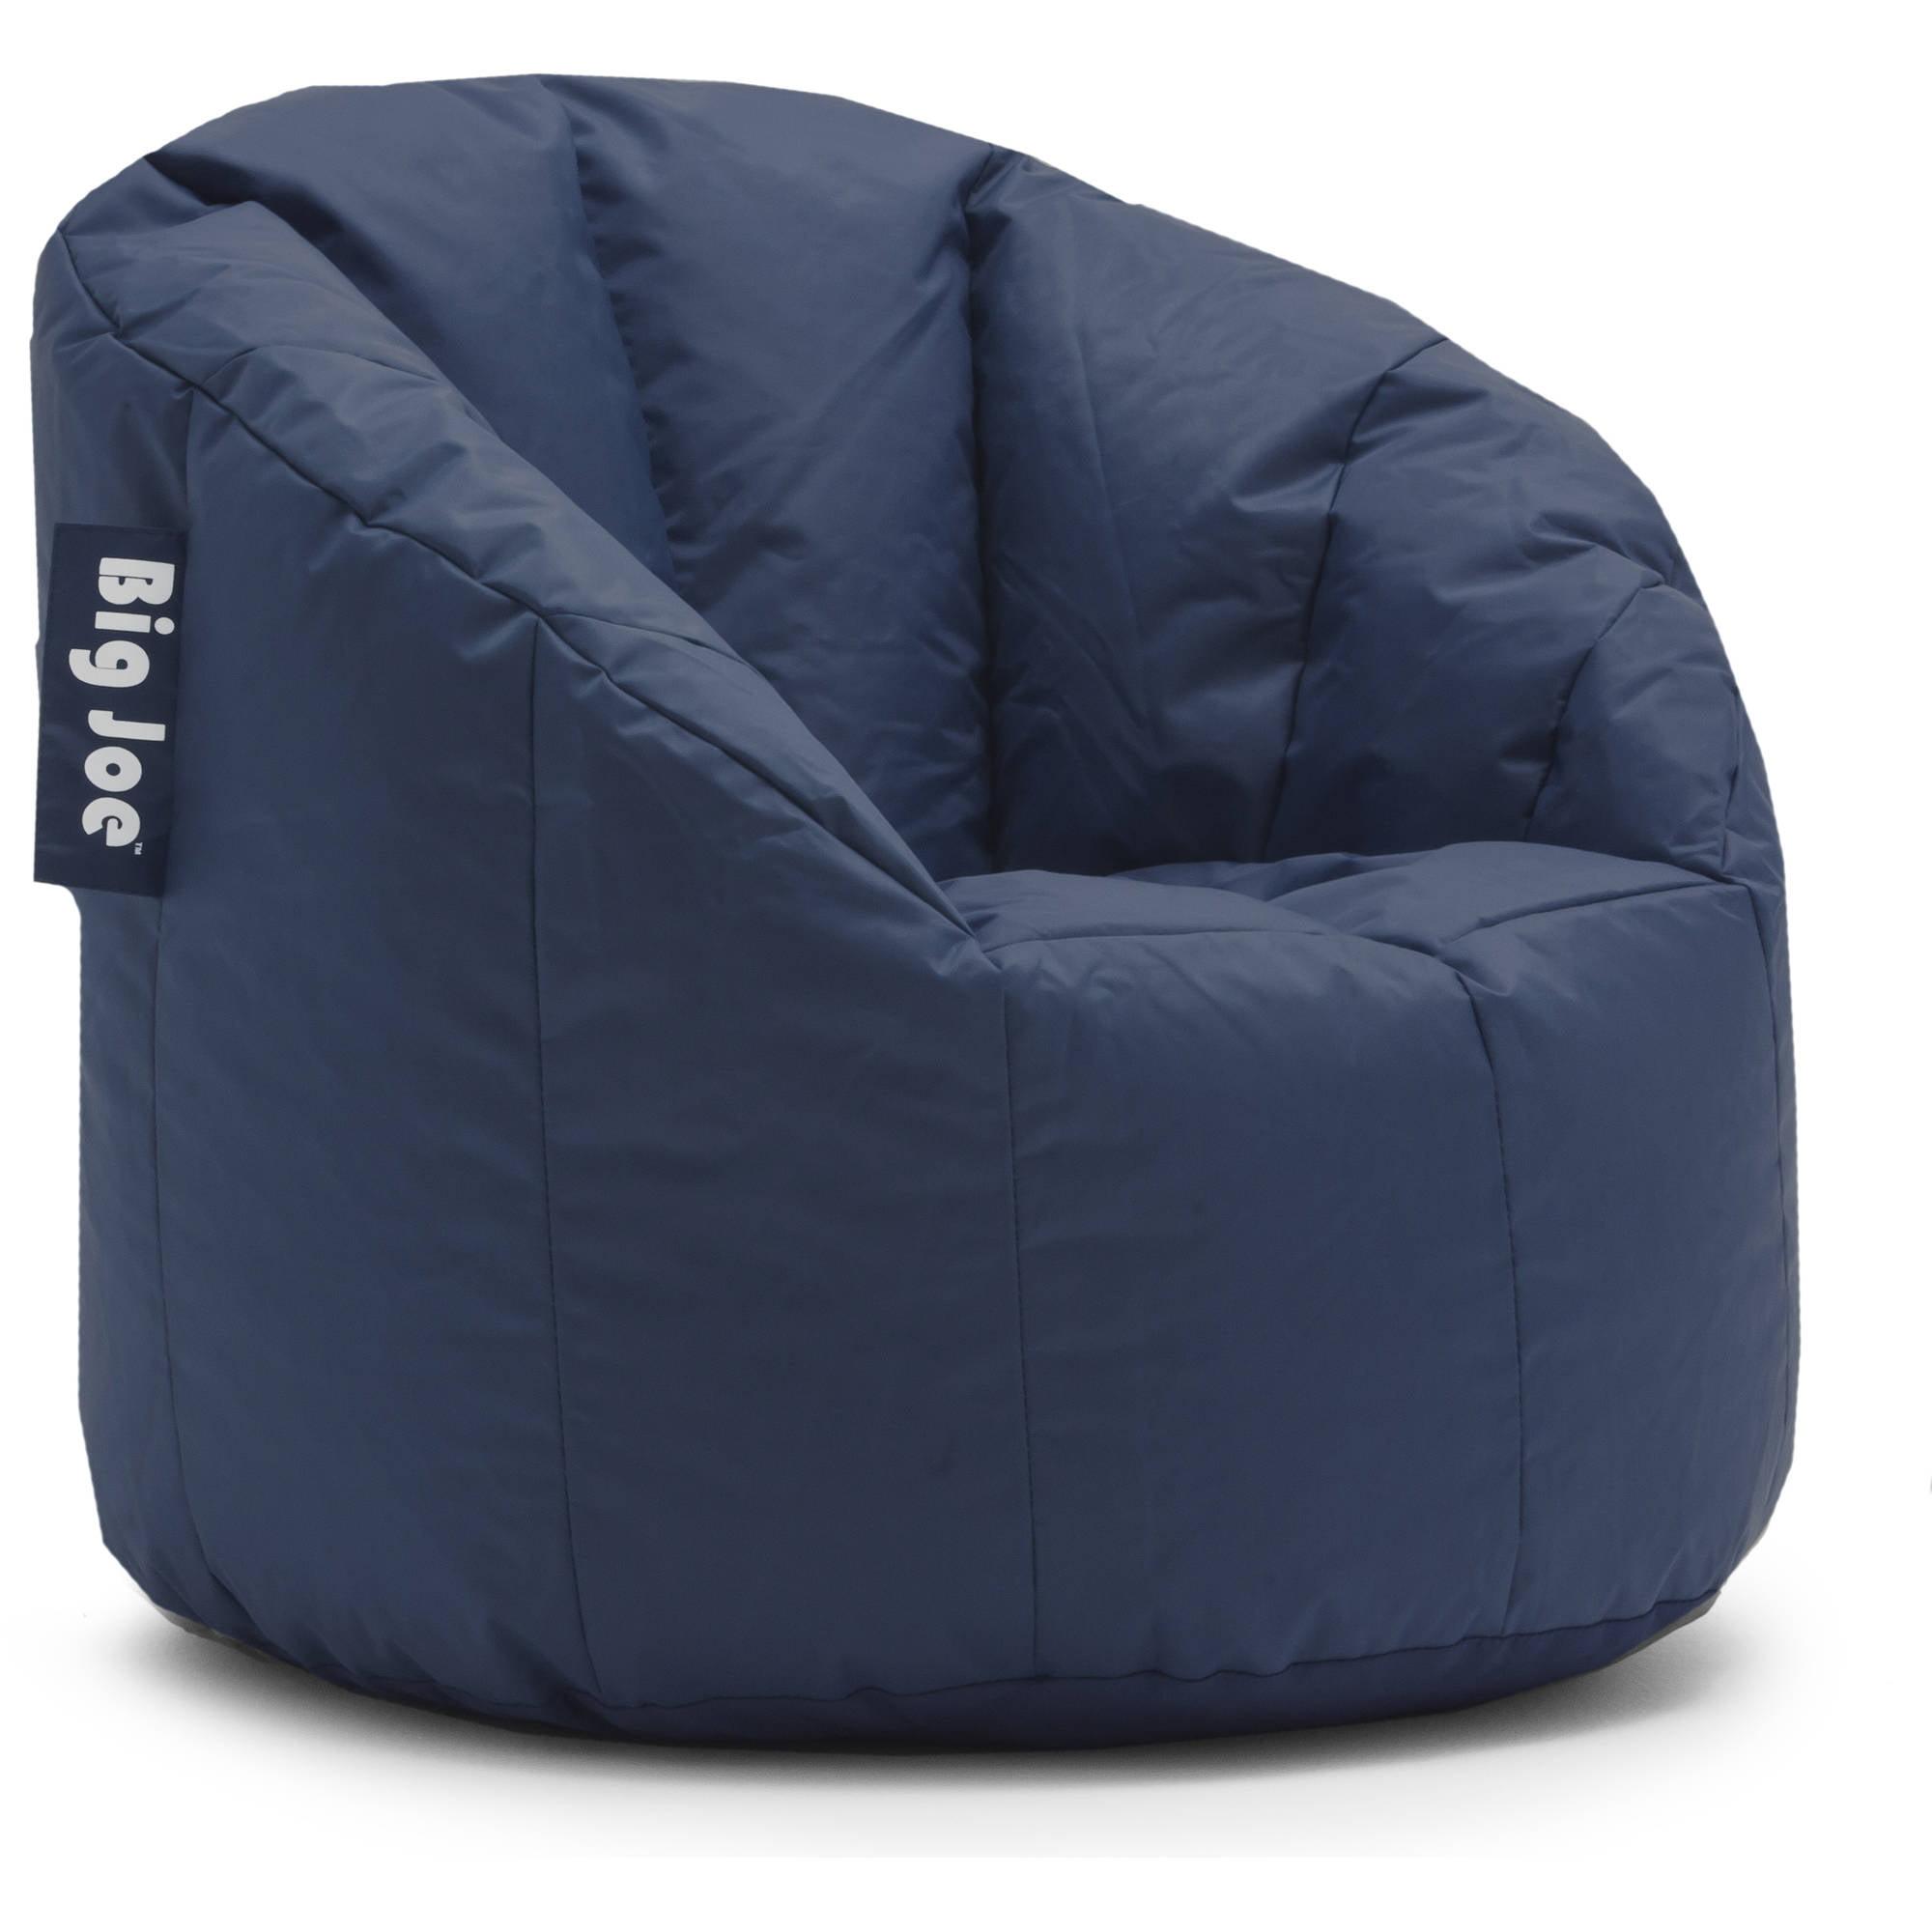 big bean bag chairs Big Joe Milano Bean Bag Chair, Multiple Colors   32